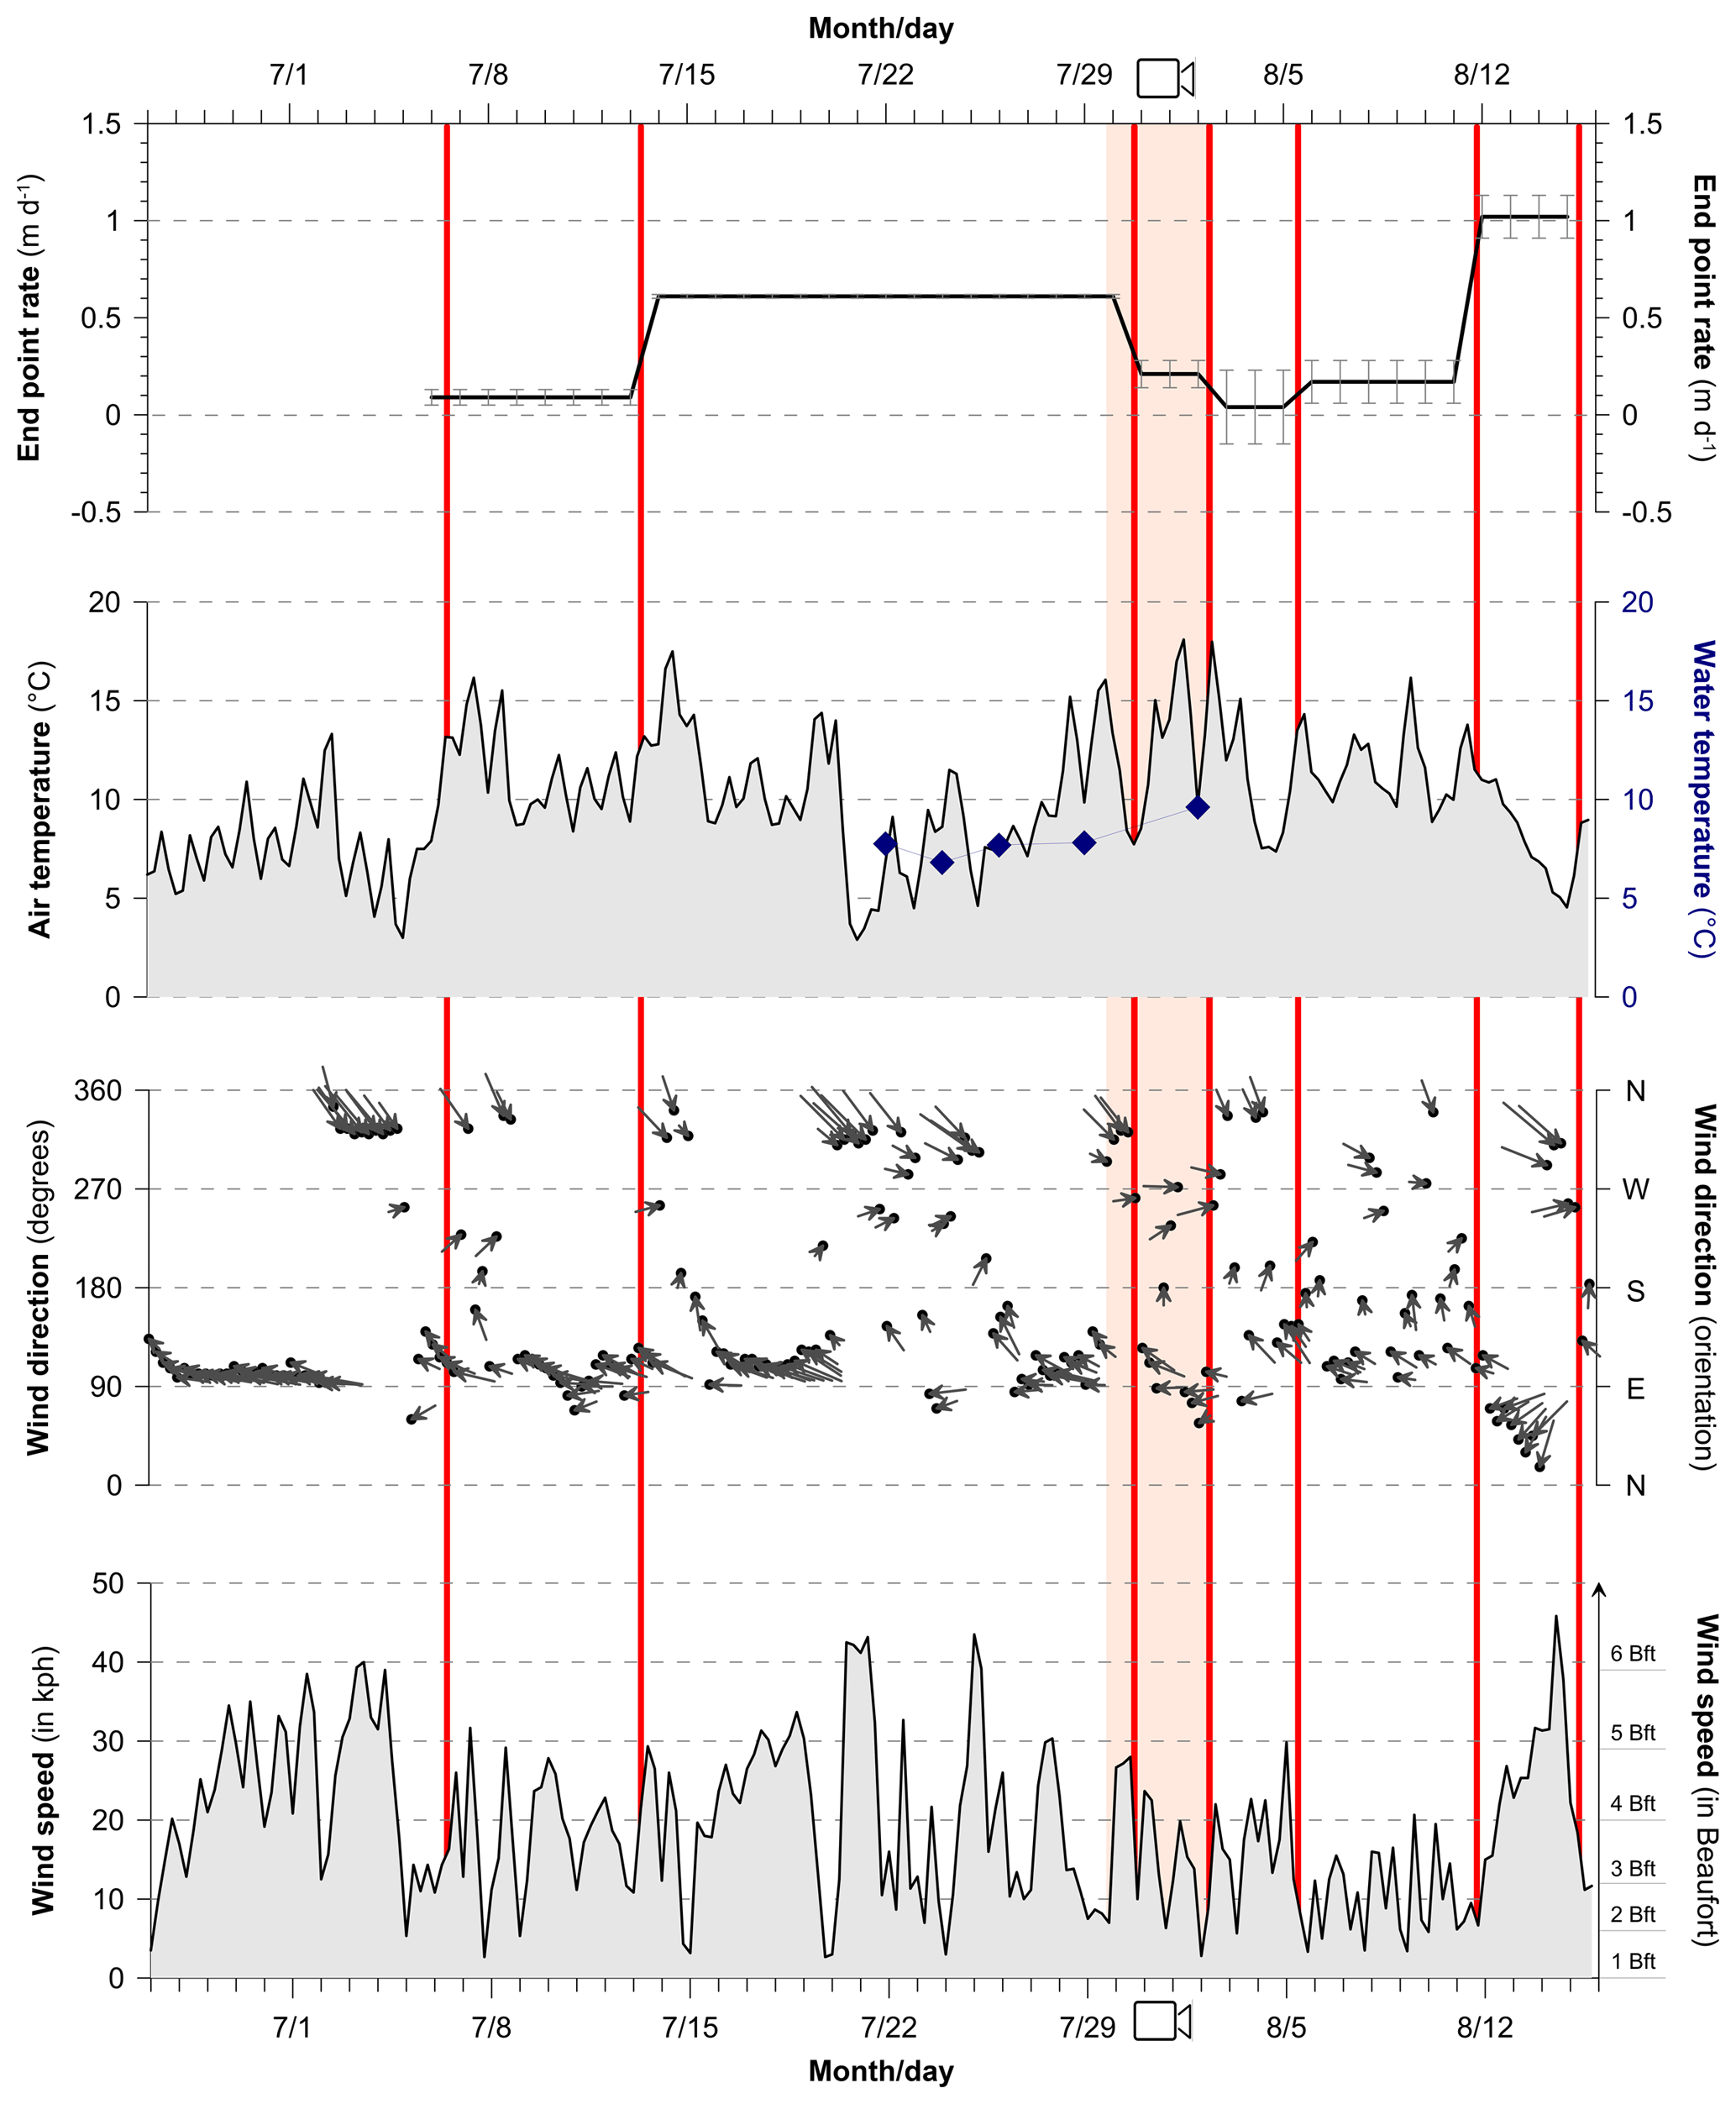 TC - Rapid retreat of permafrost coastline observed with